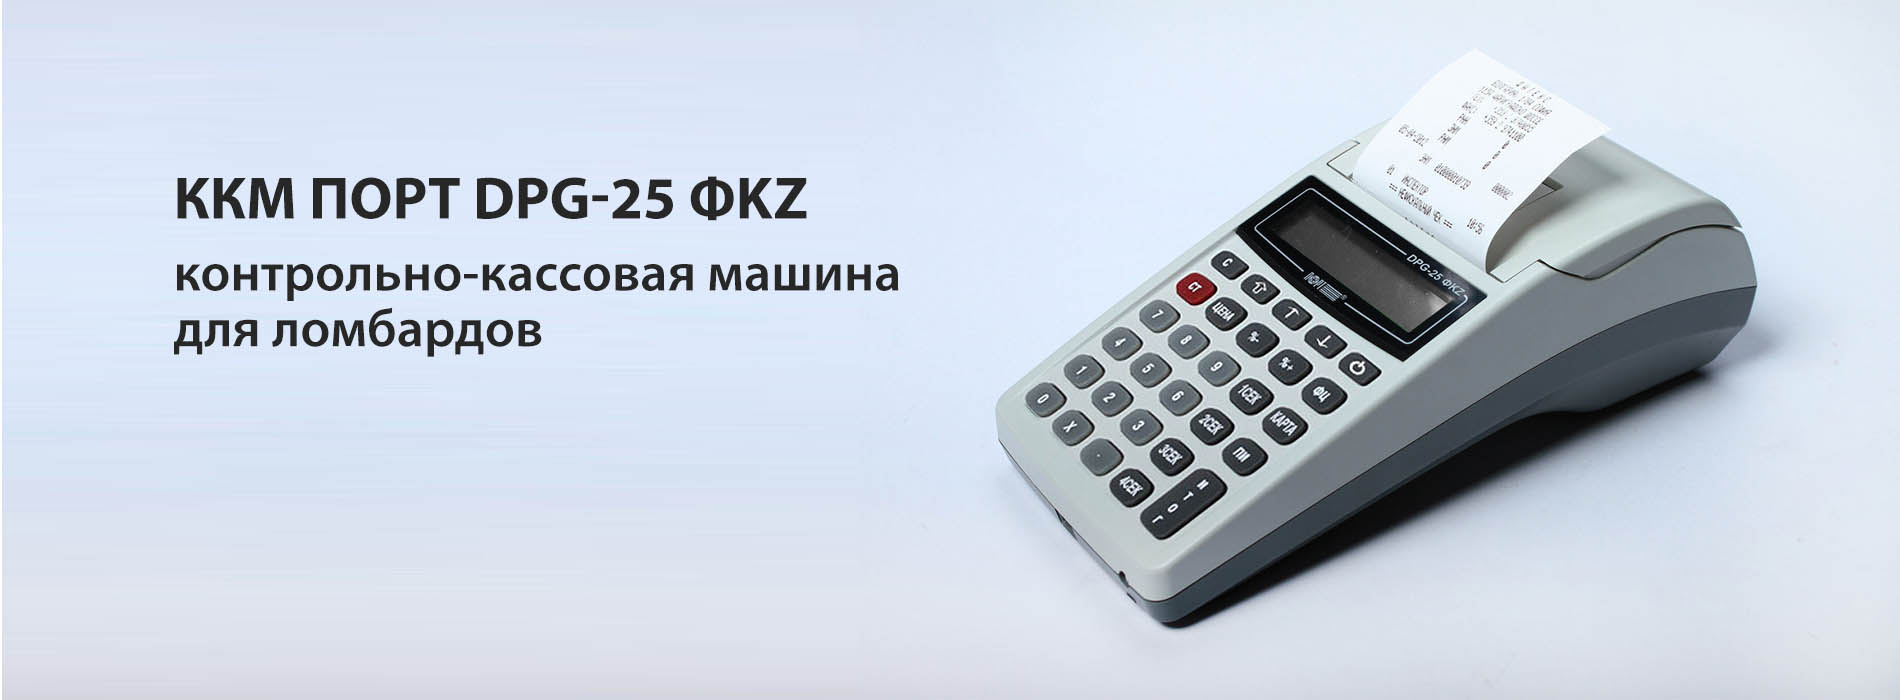 ККМ ПОРТ DPG-25 ФKZ